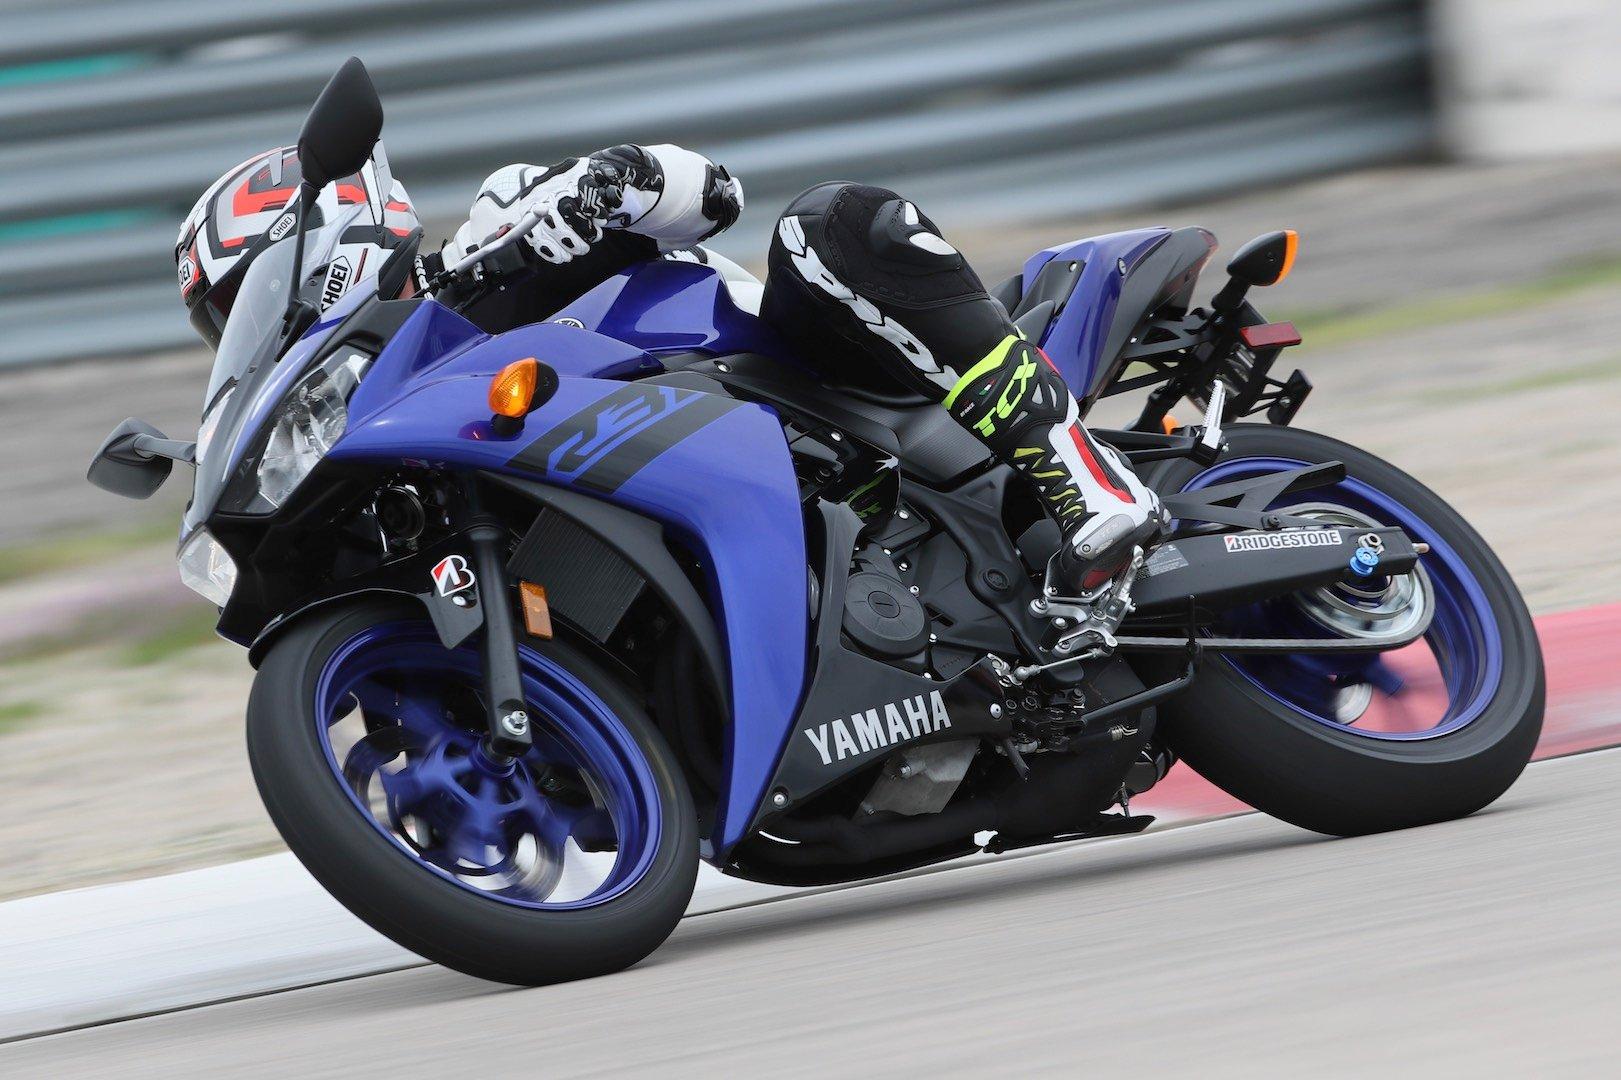 2018 Yamaha Sportbike Lineup Review R3 R6 R1 R1m